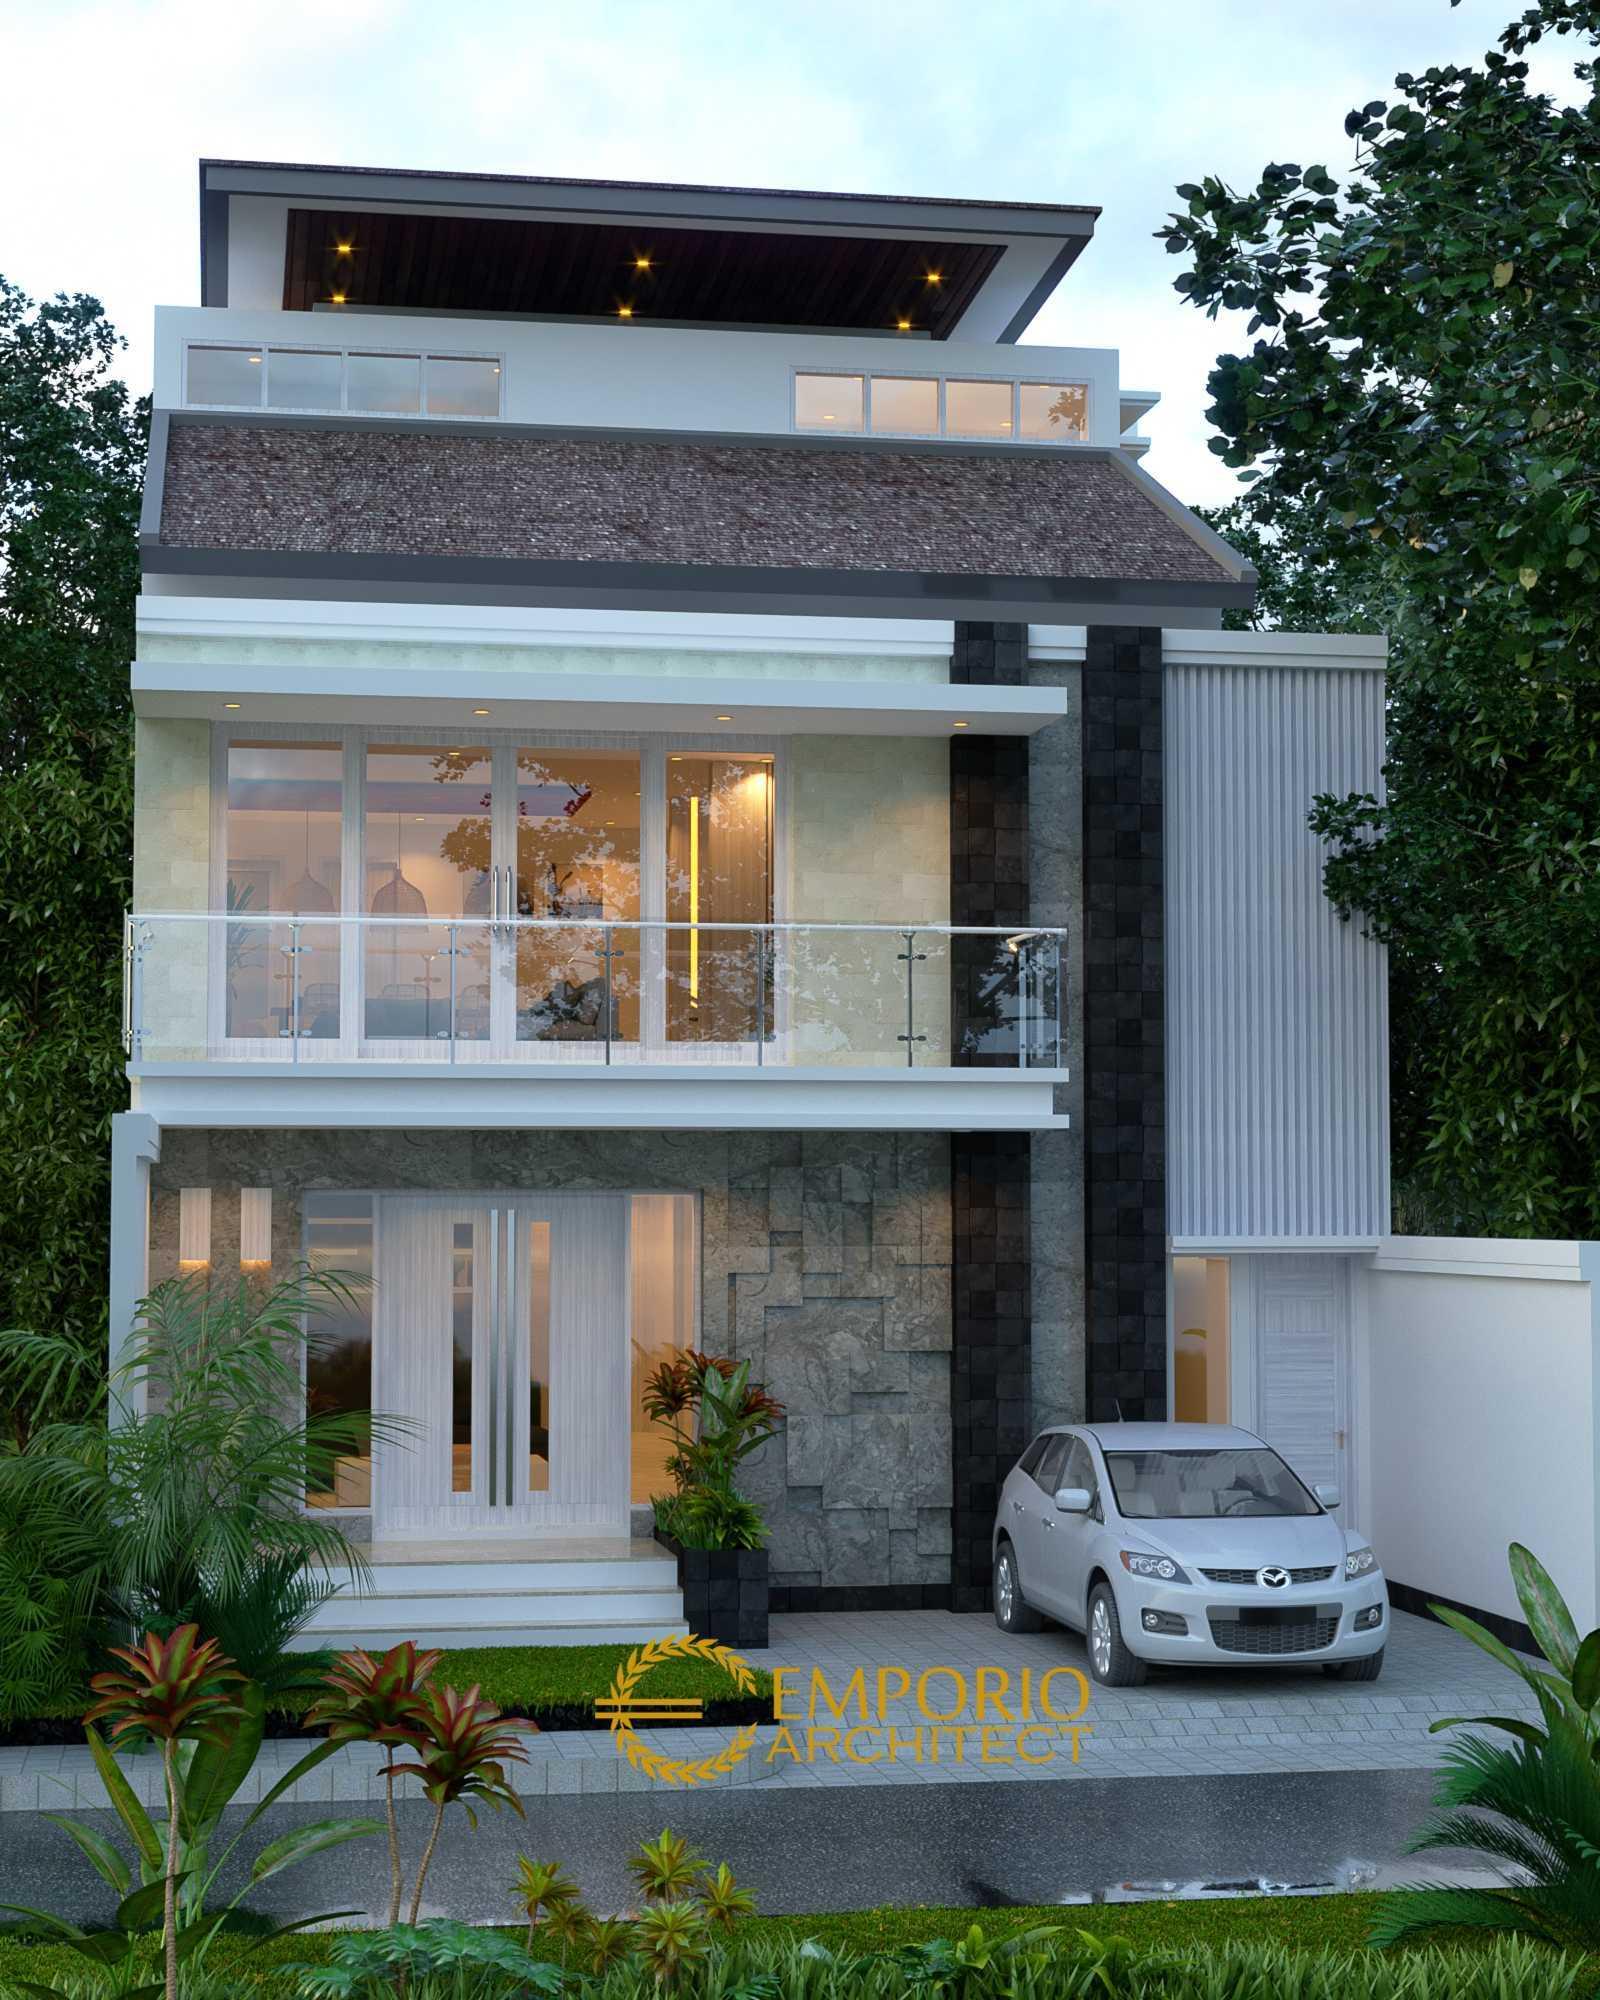 Jasa Arsitek Emporio Architect di Sulawesi